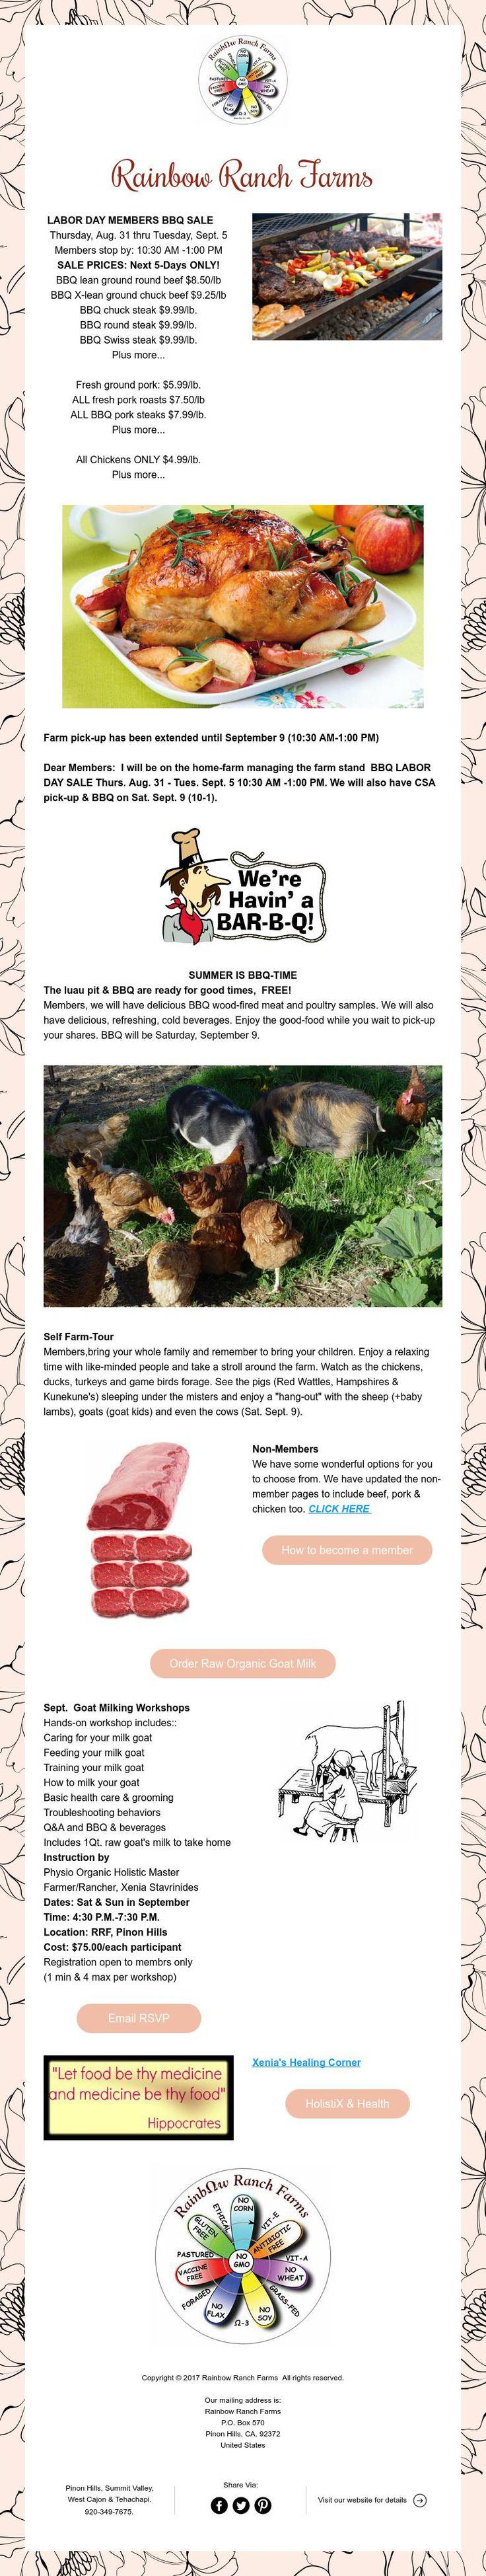 Huge Labor Day BBQ-Sale 5-Days Only! Click Link for Details!